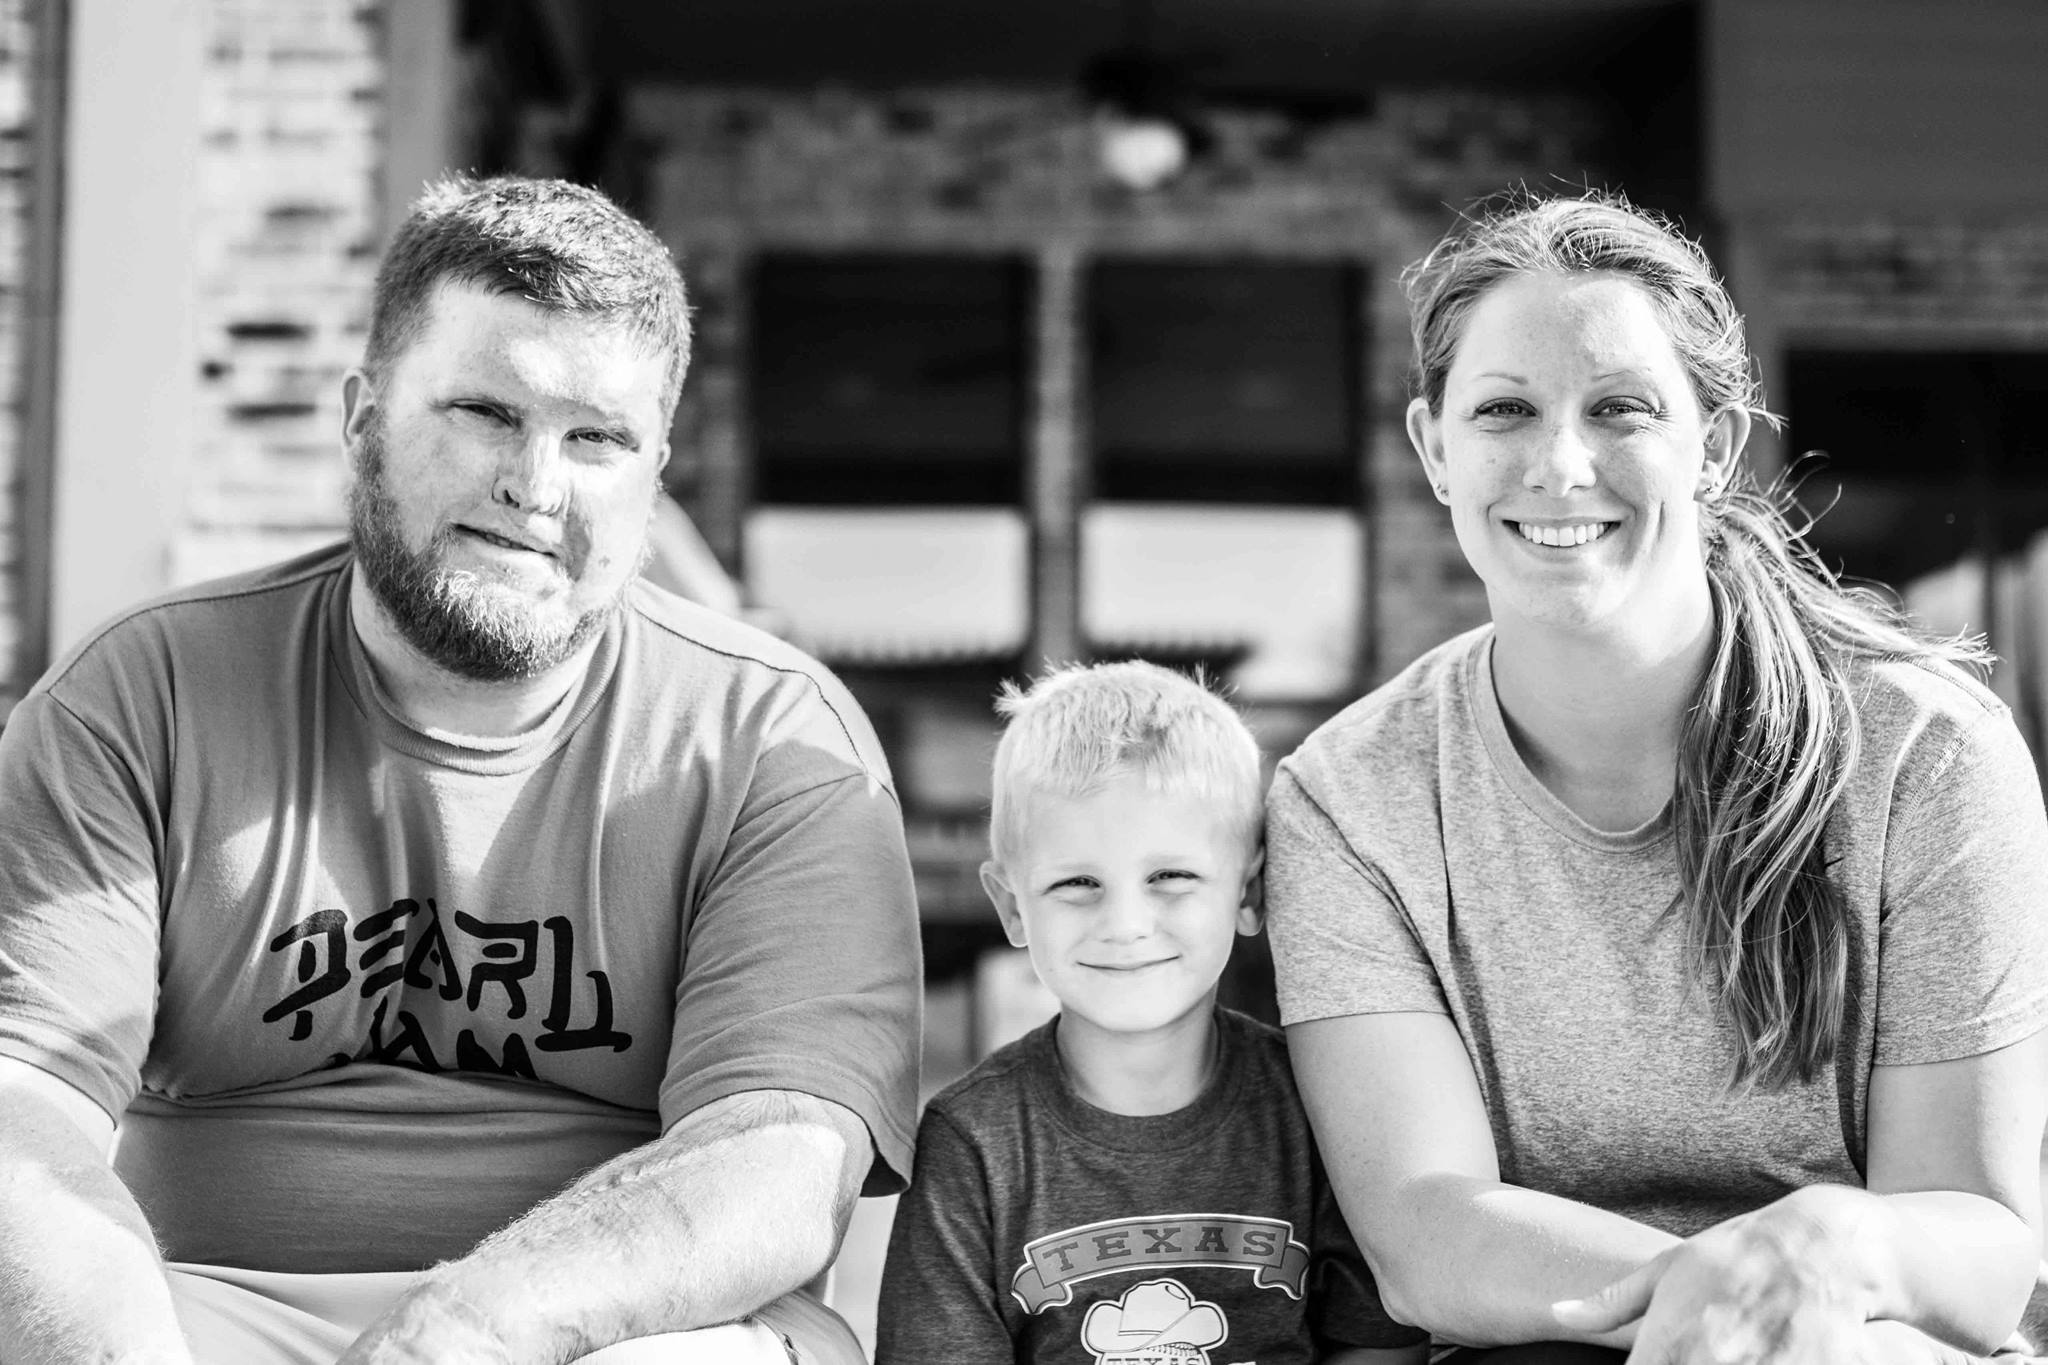 Joe, son King, and wife Jenn